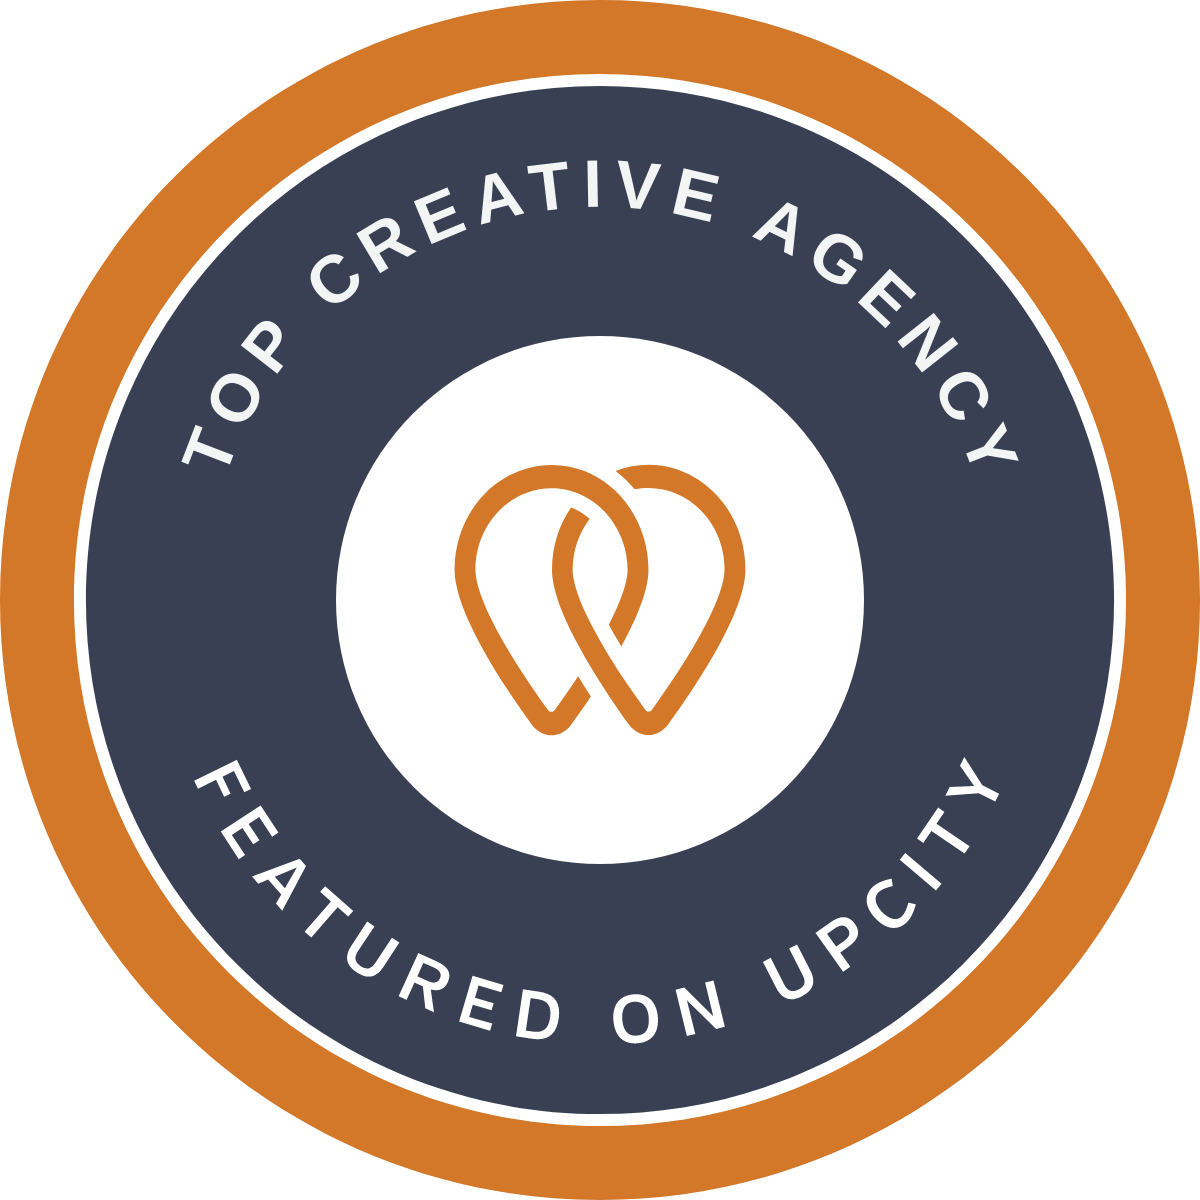 TOP CREATIVE AGENCY